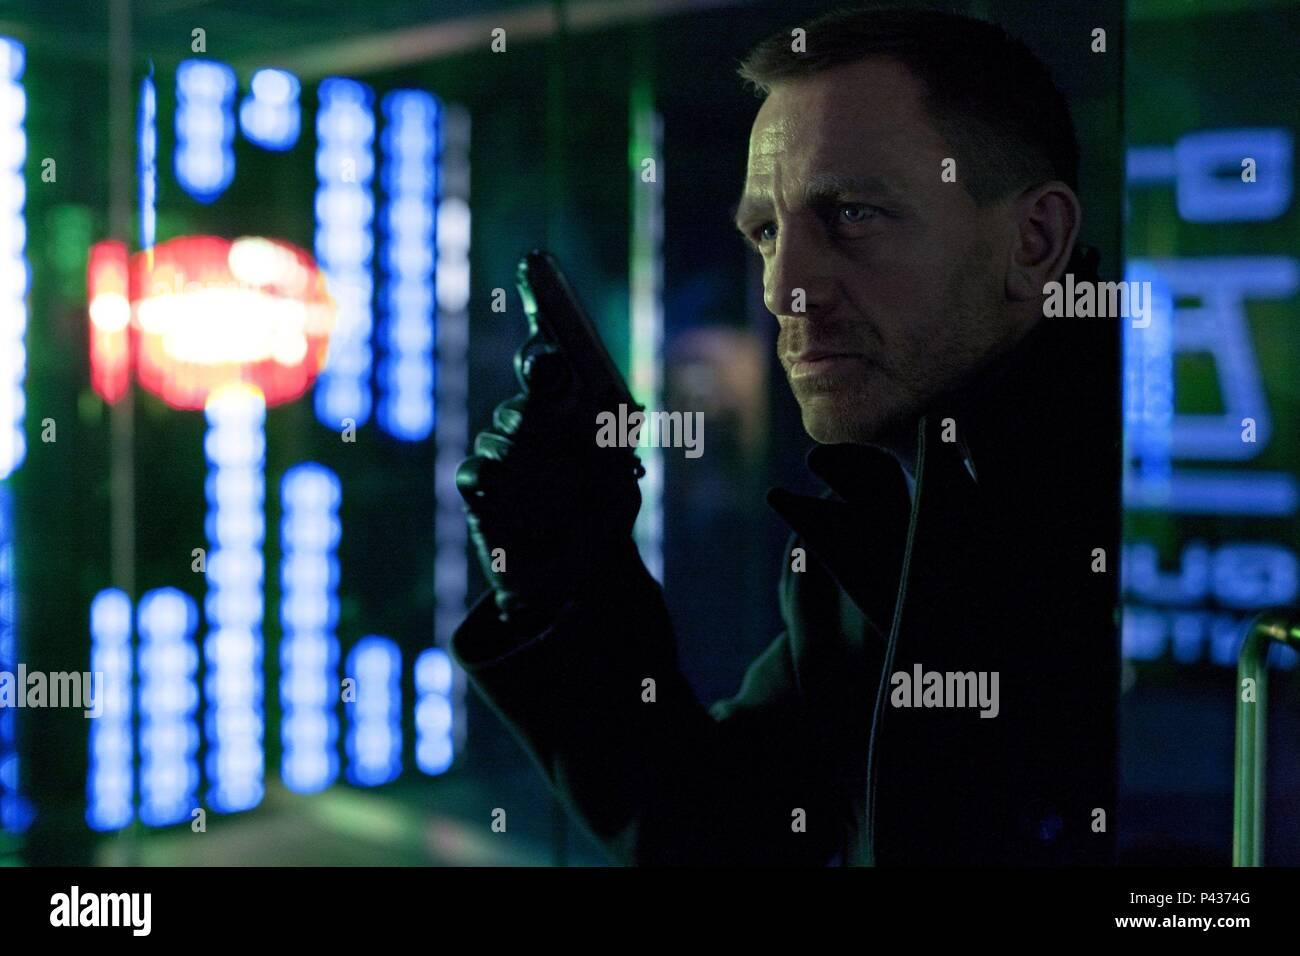 Original Film Title: SKYFALL.  English Title: SKYFALL.  Film Director: SAM MENDES.  Year: 2012.  Stars: DANIEL CRAIG. Credit: COLUMBIA PICTURES / Album - Stock Image